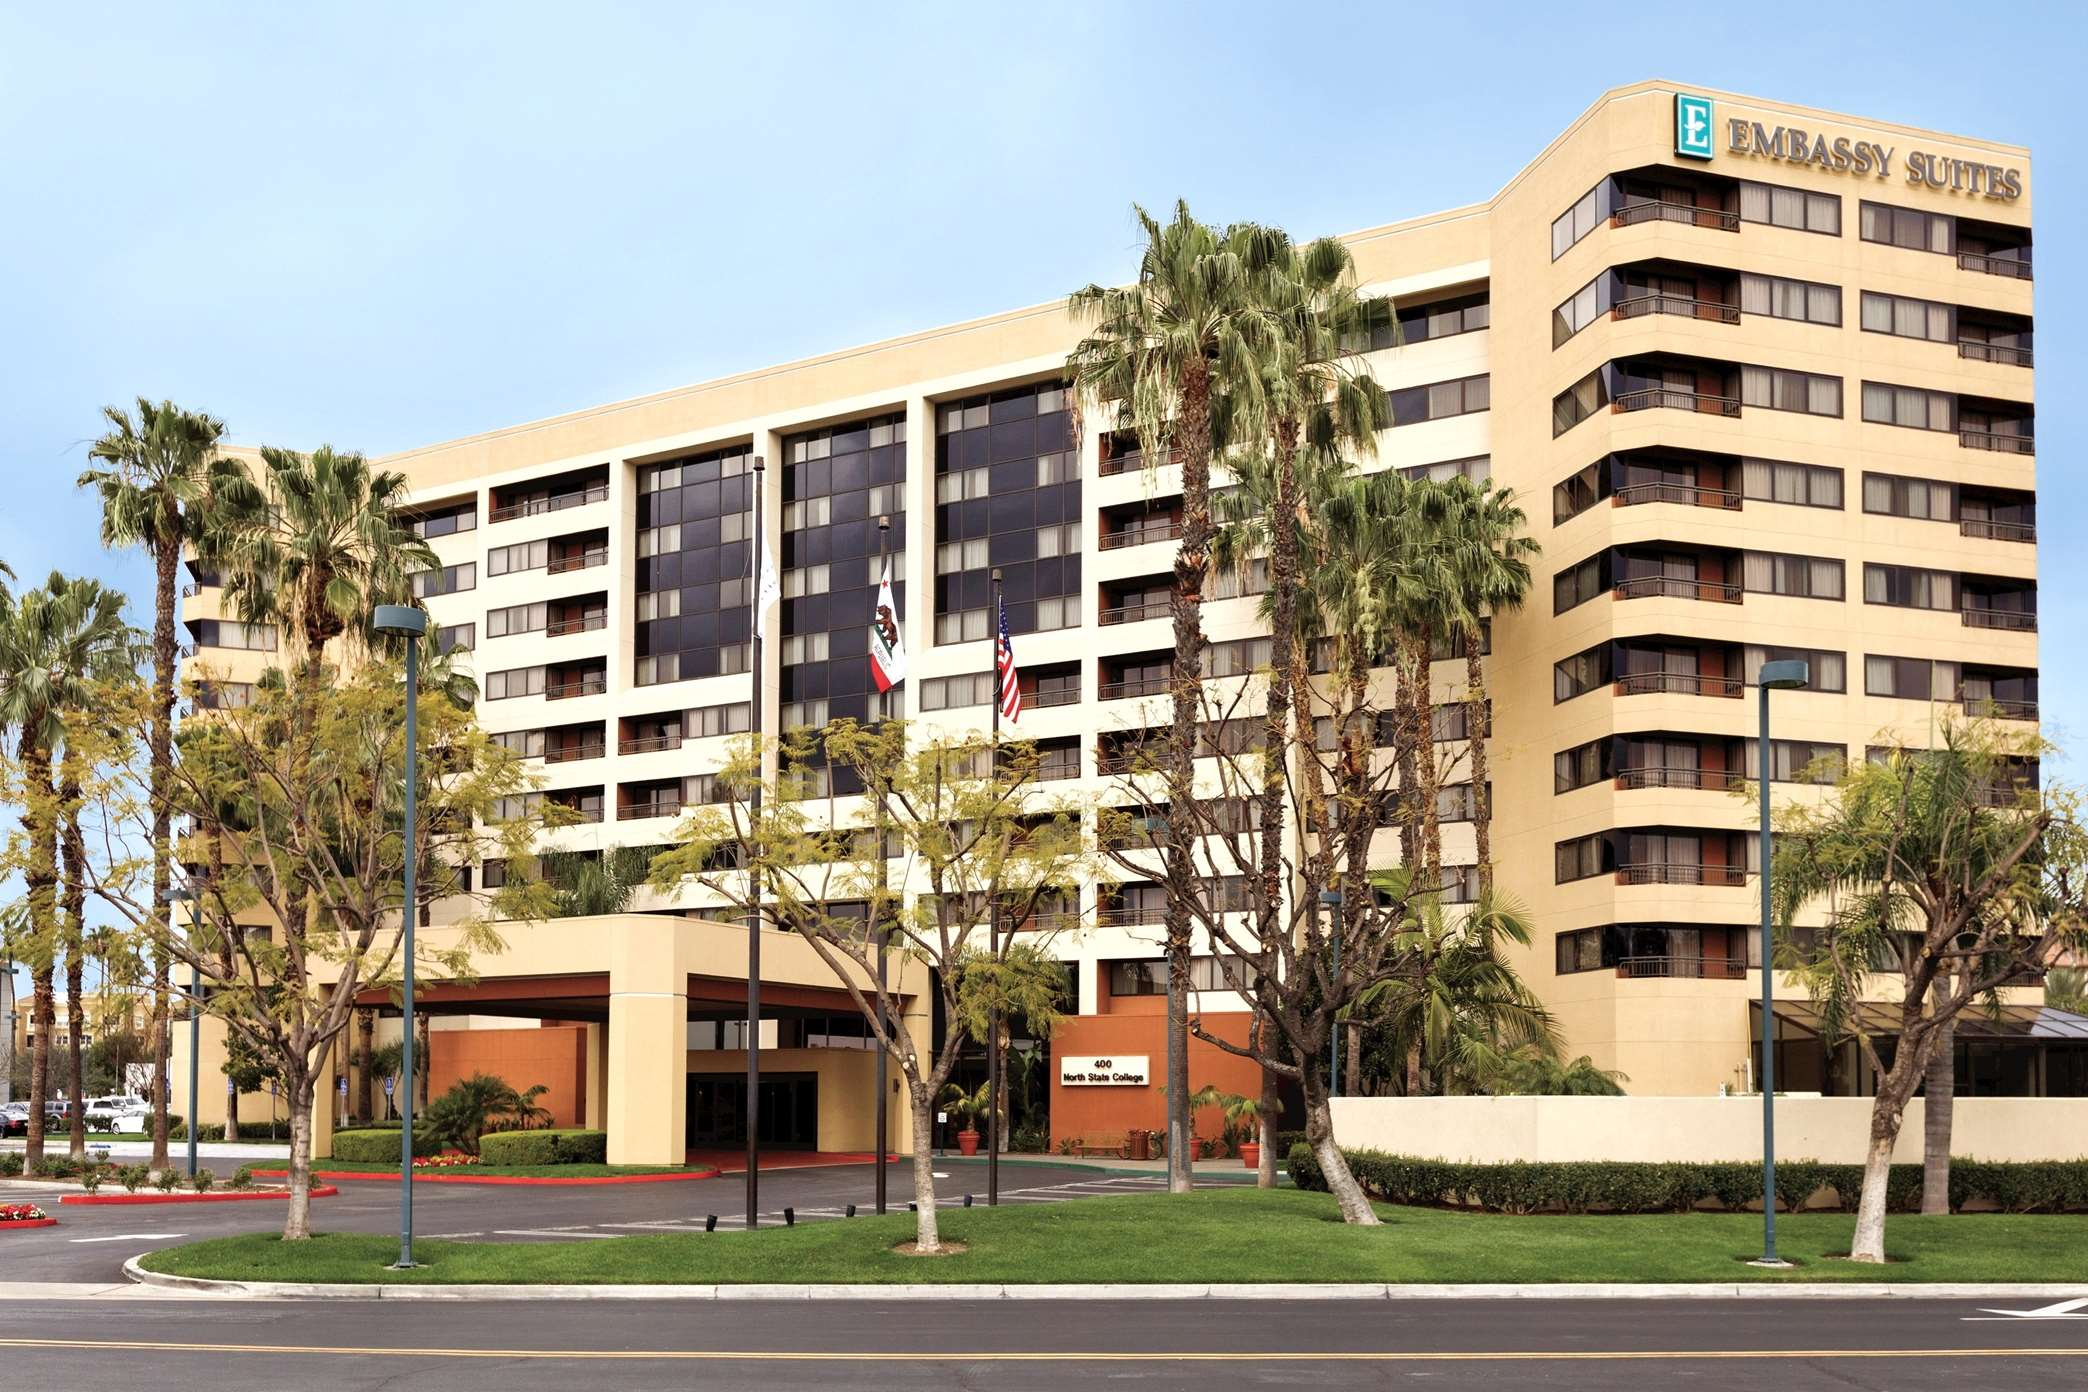 embassy suites by hilton anaheim orange orange california. Black Bedroom Furniture Sets. Home Design Ideas